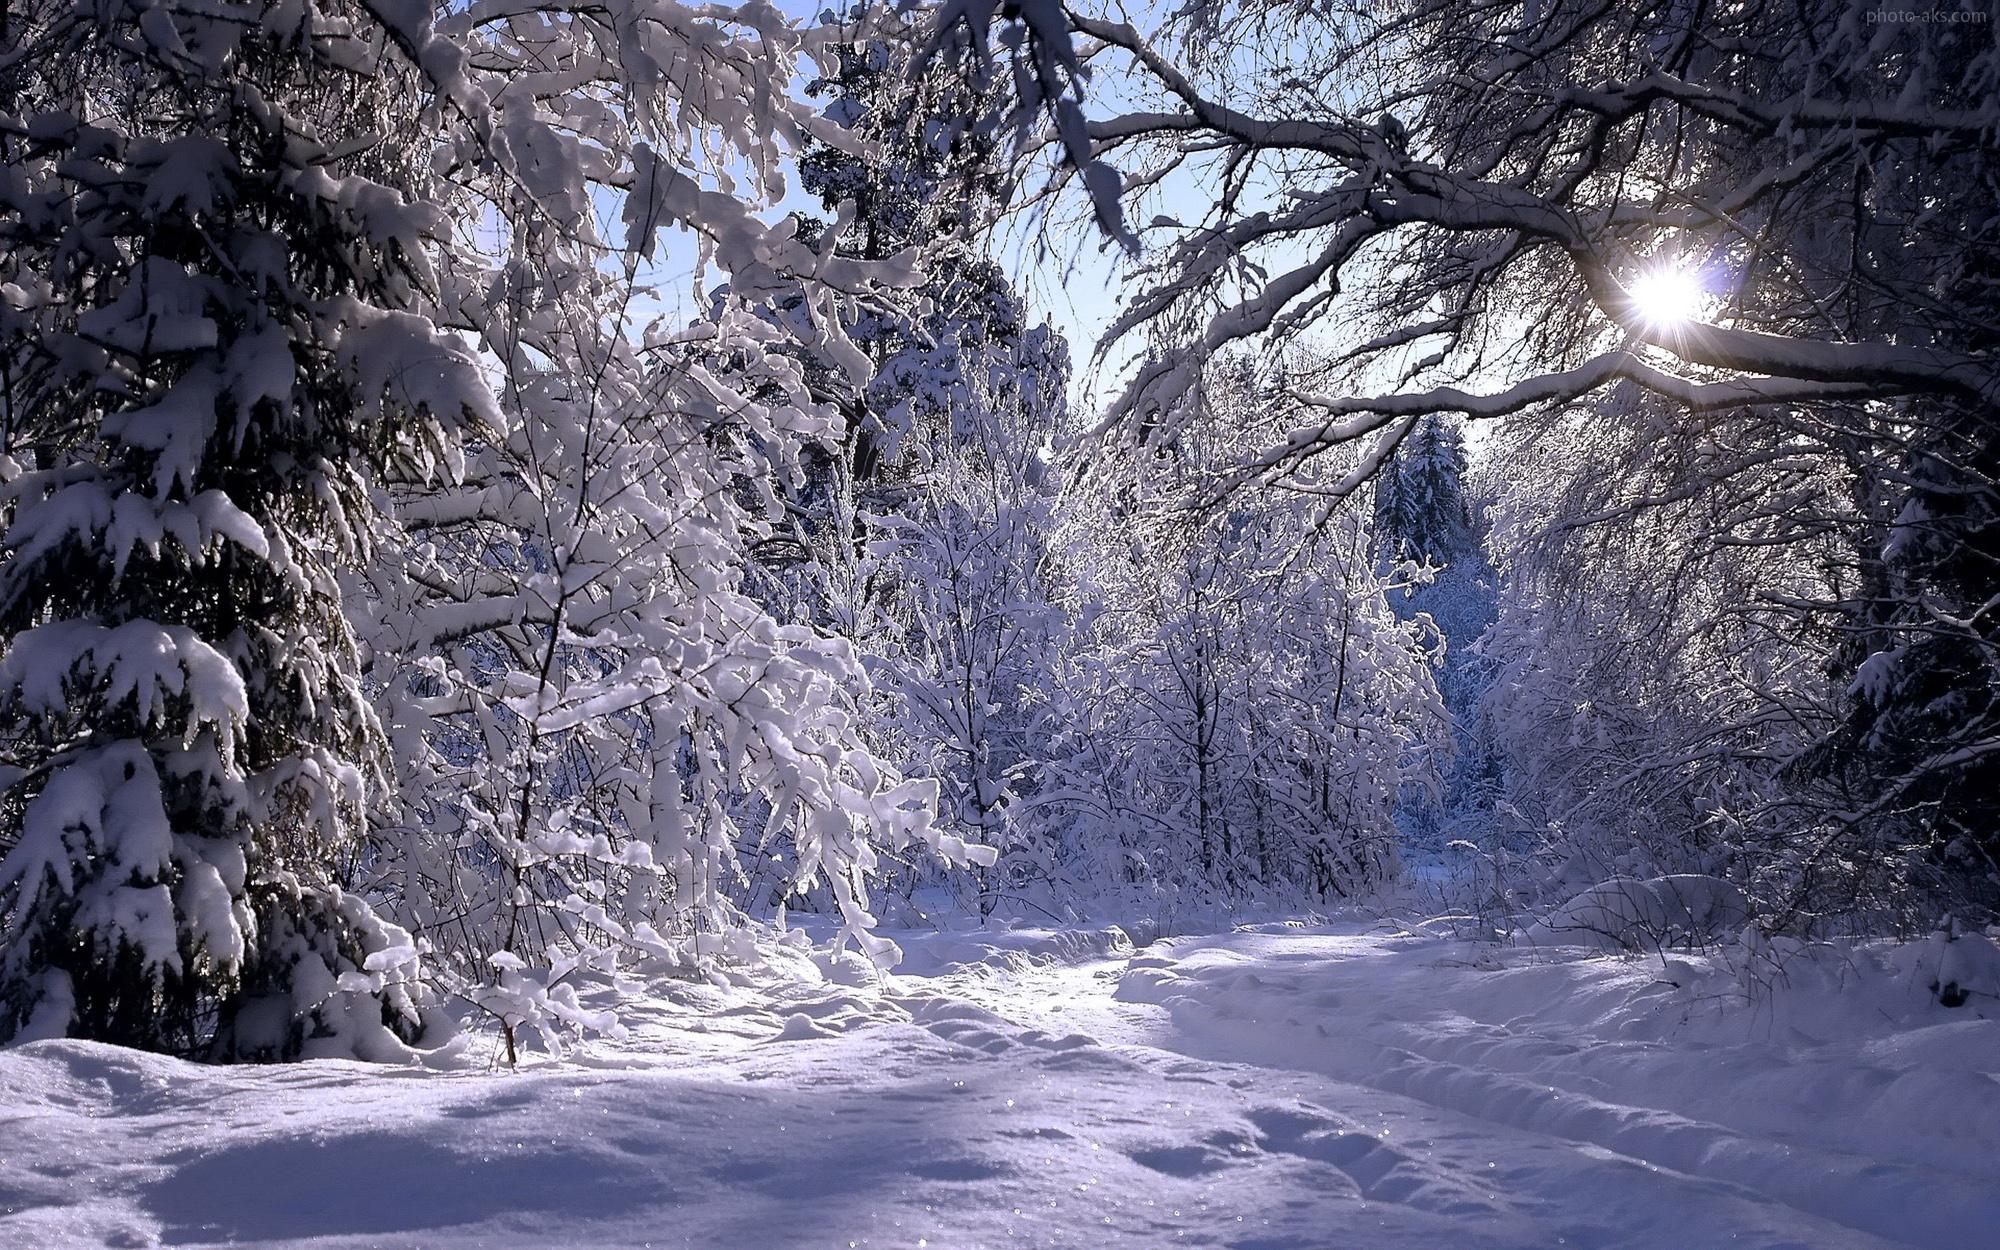 https://iranbanou.com/wp-content/uploads/2019/01/Rambling-in-winter-forest.jpg